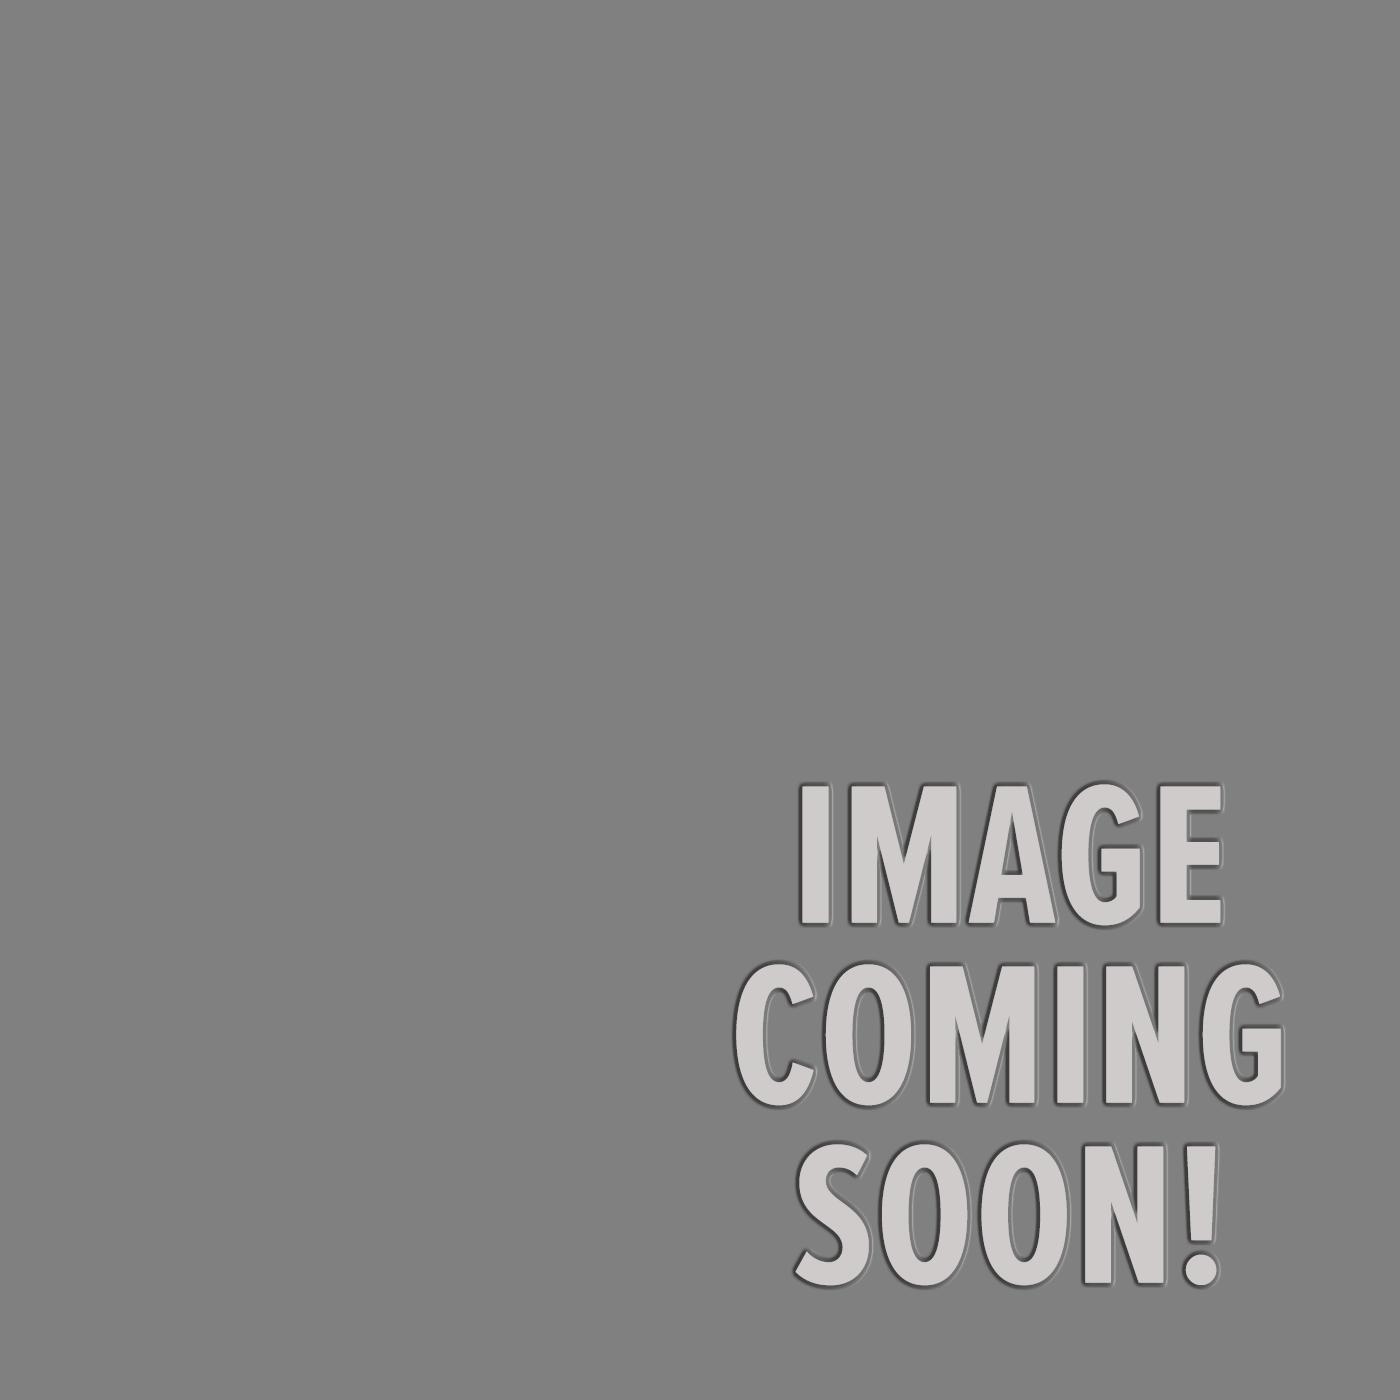 Fender American Acoustasonic Stratocaster Acoustic-Electric Guitar Dakota Red